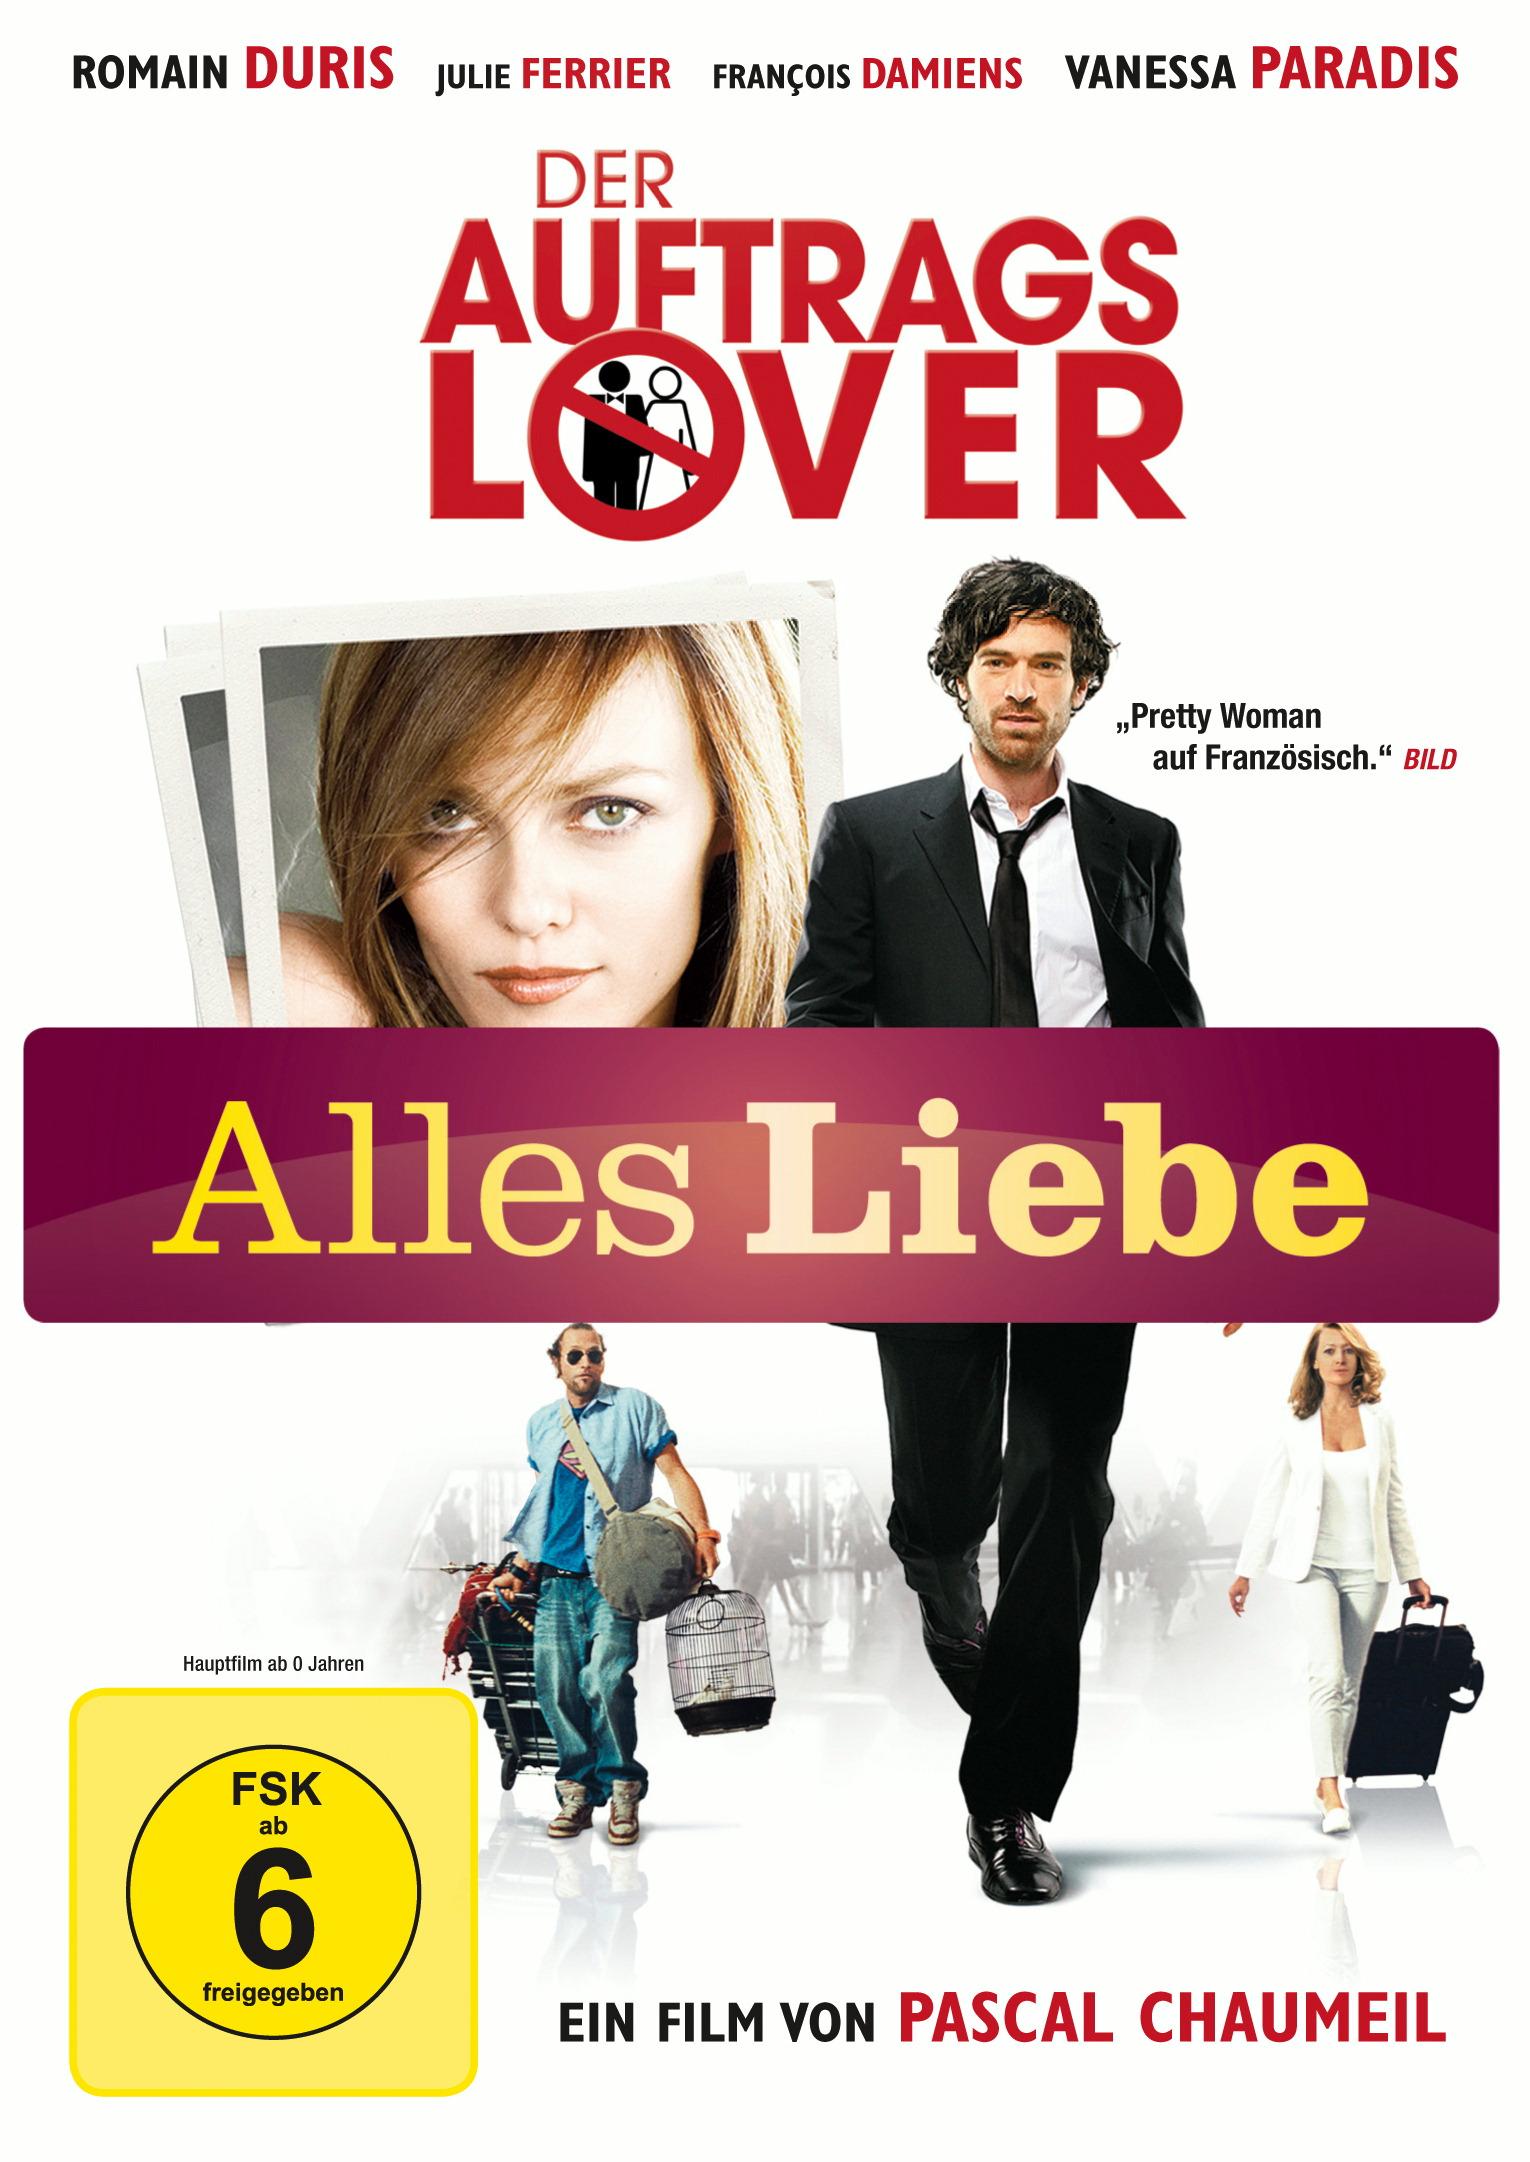 Der Auftragslover (Alles Liebe) Poster